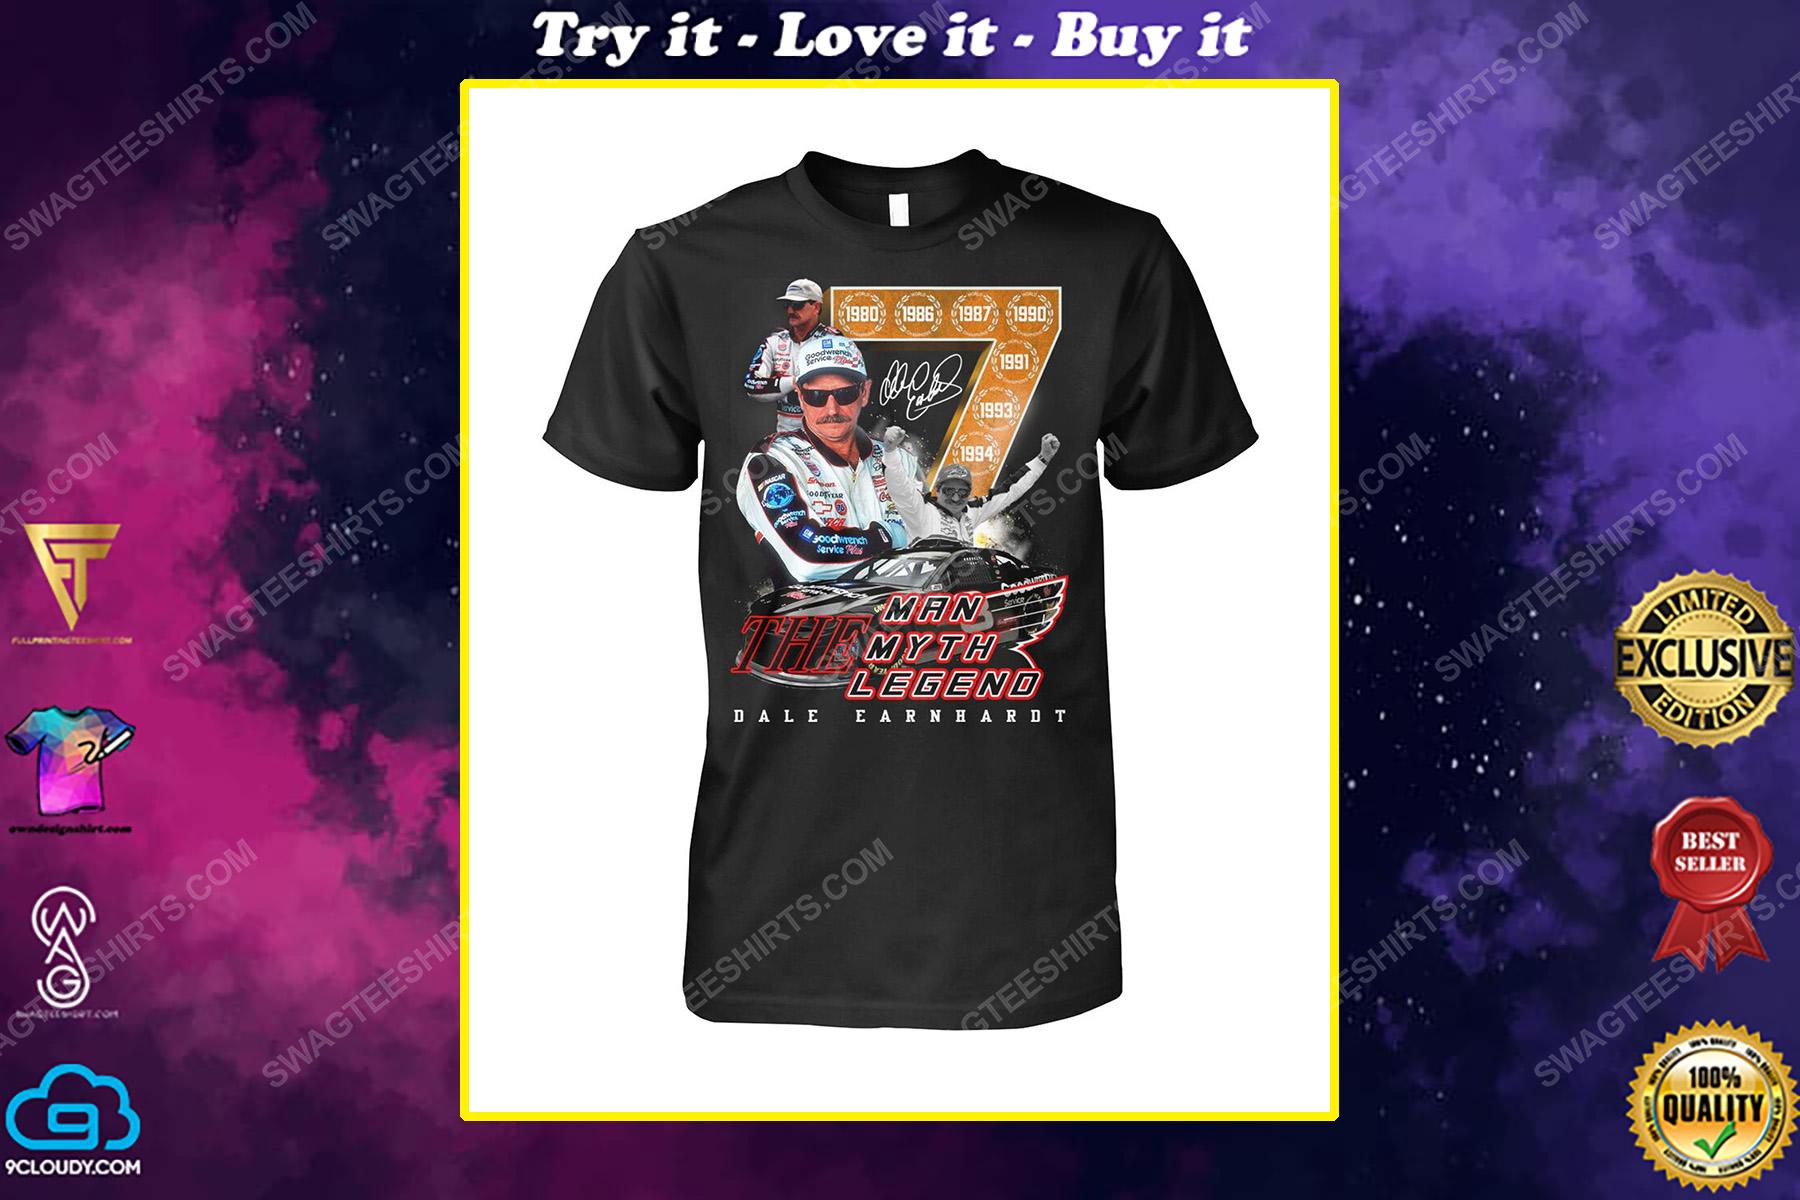 The man the myth the legend dale earnhardt car driver shirt